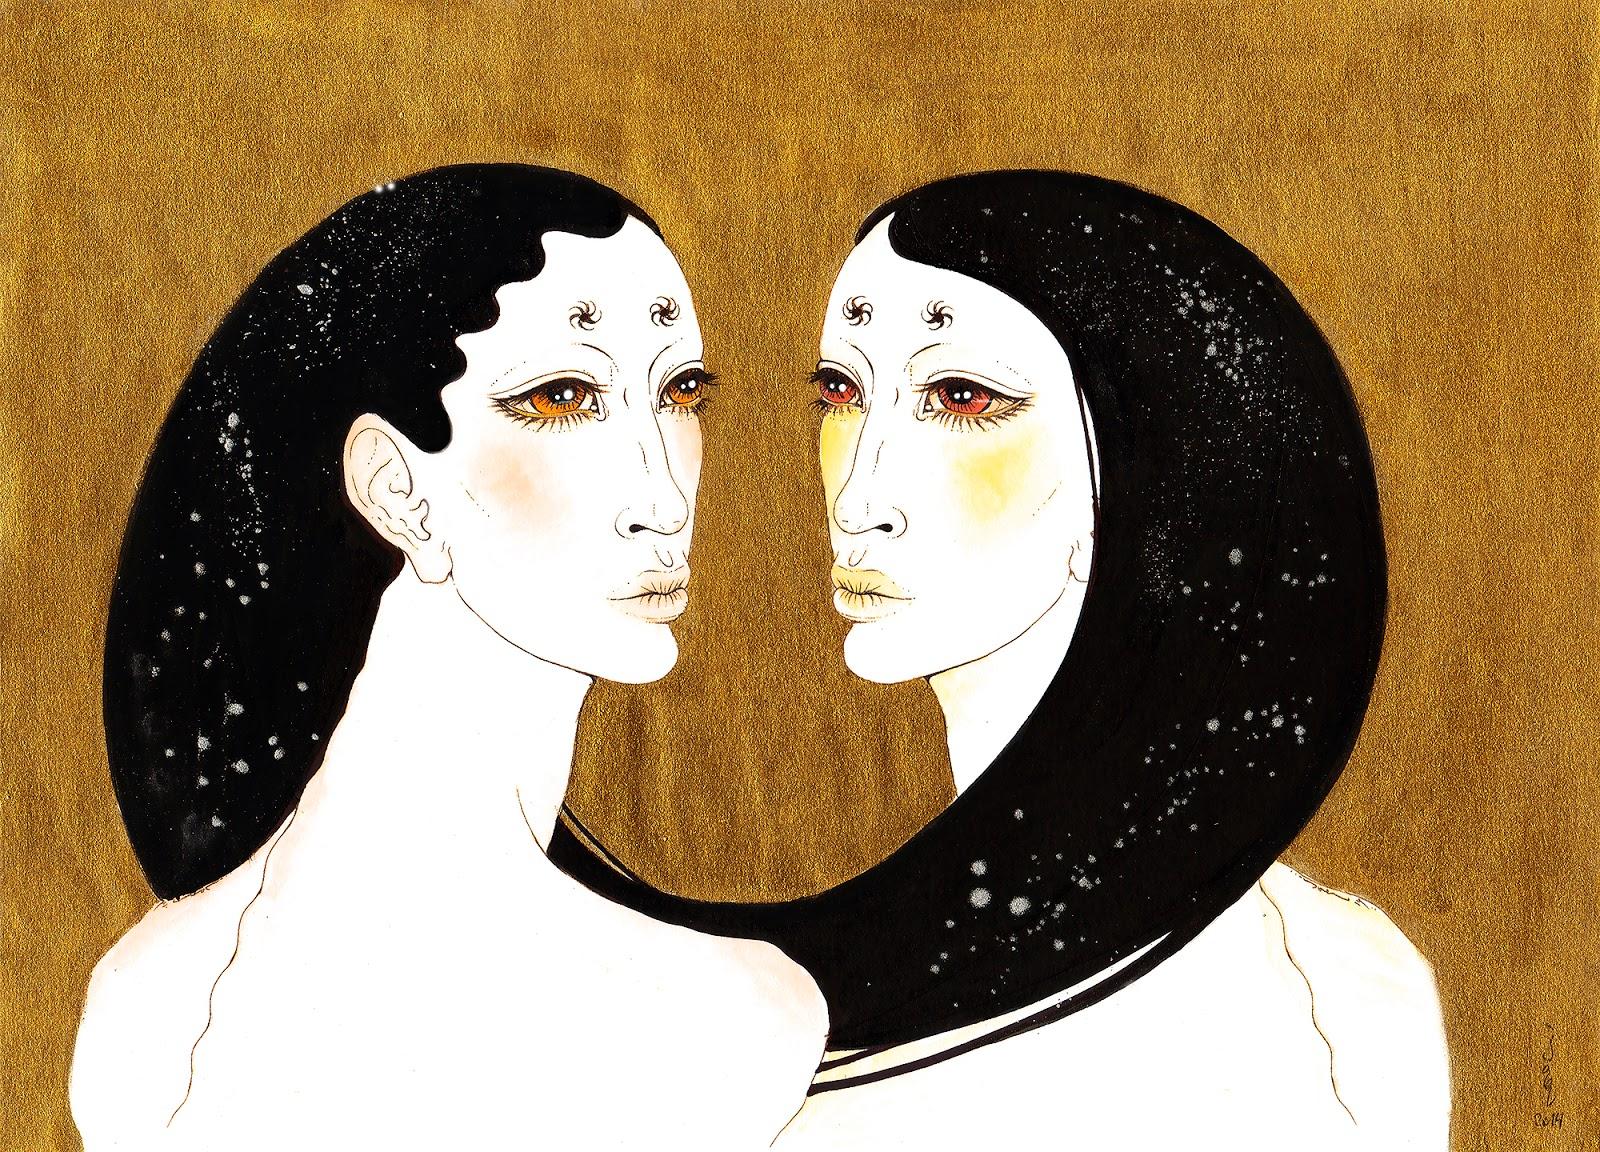 http://jael-art.tumblr.com/